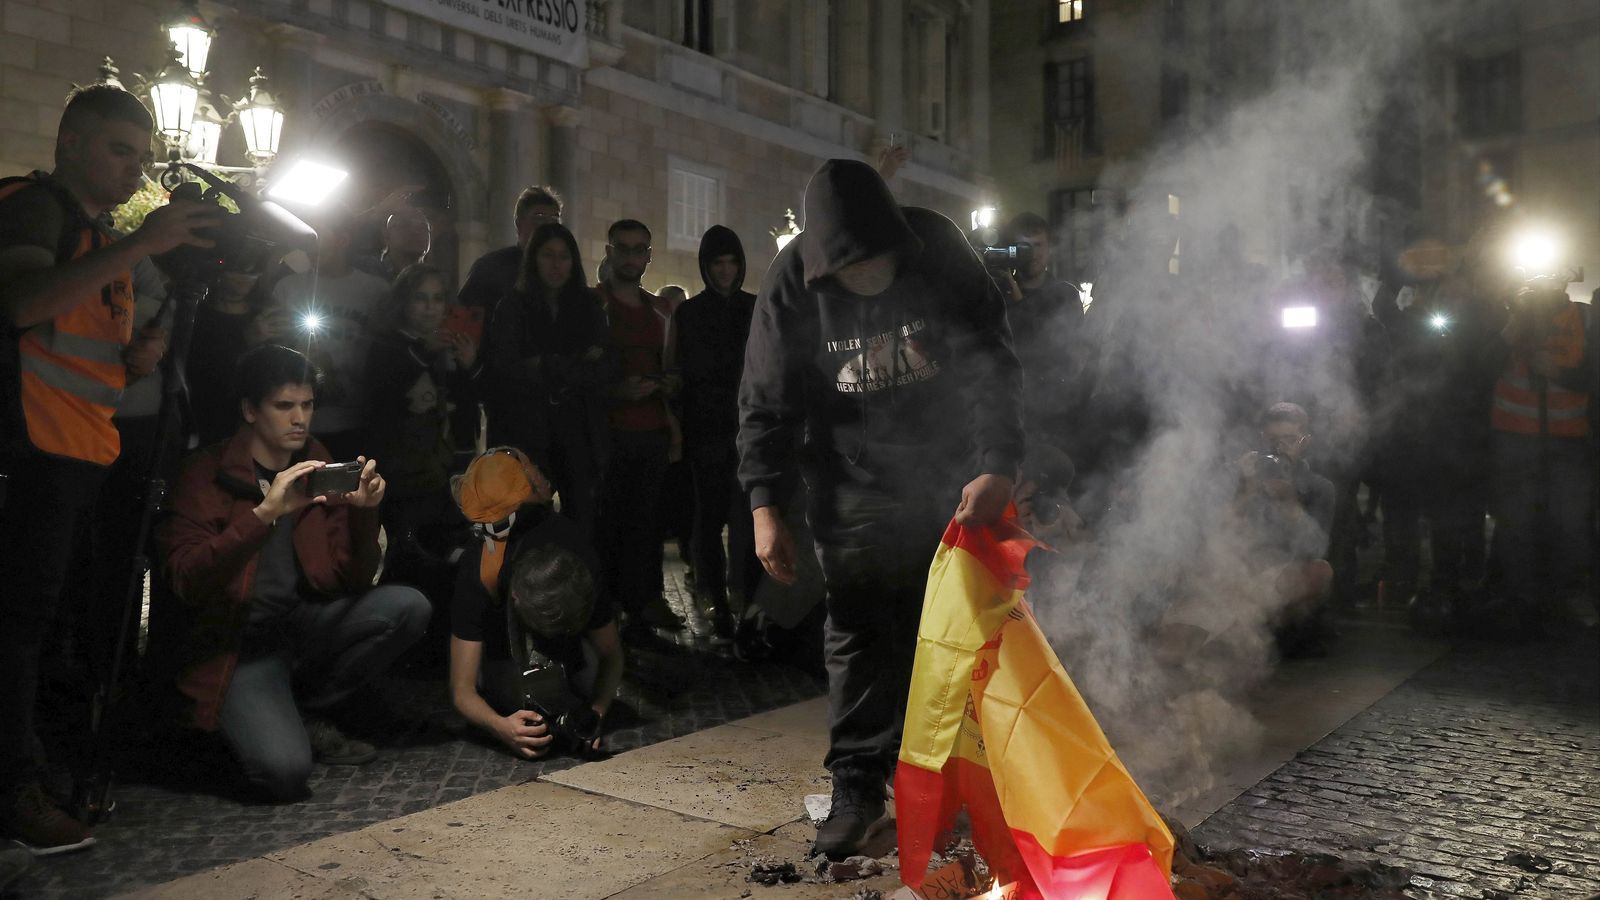 Un manifestant crema una bandera espanyola en una protesta a la plaça Sant Jaume de Barcelona / ANDREU DALMAU / EFE